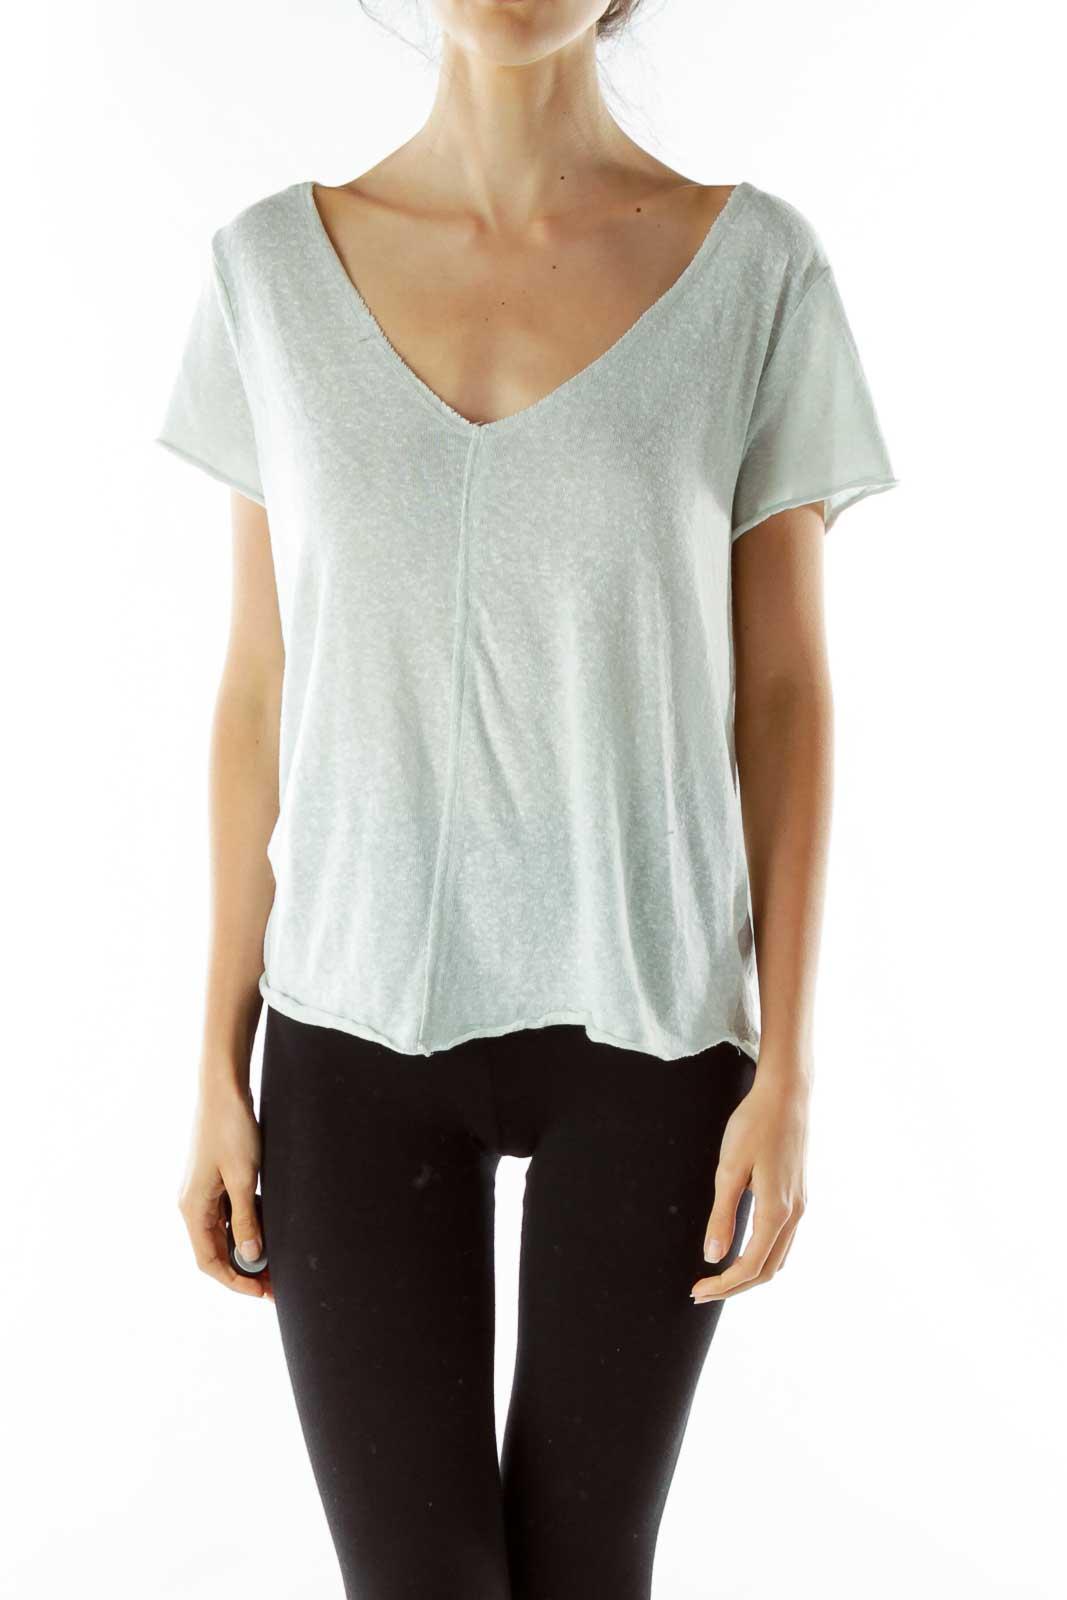 Green V-neck Knit T-shirt Front